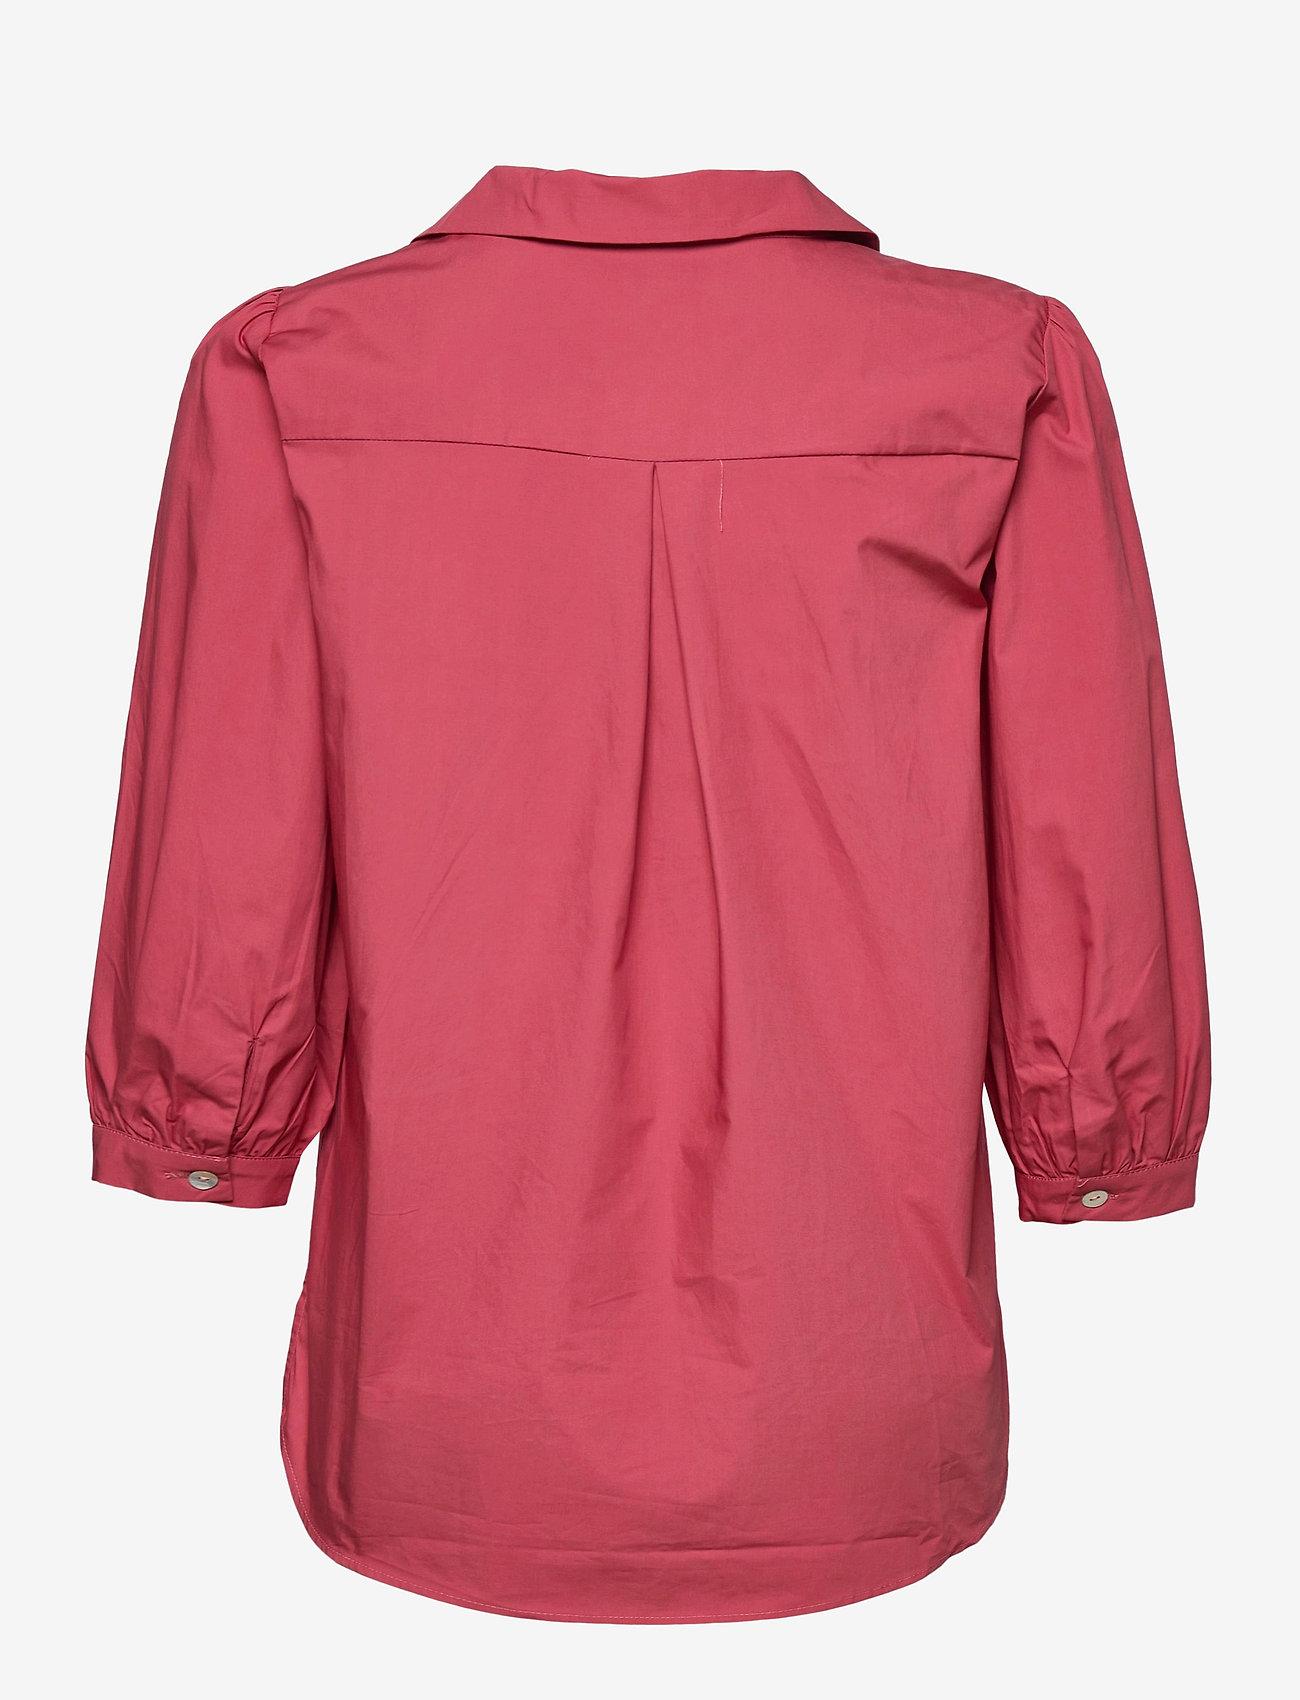 Minus - Mindi tunic - long sleeved blouses - pink lemonade - 1